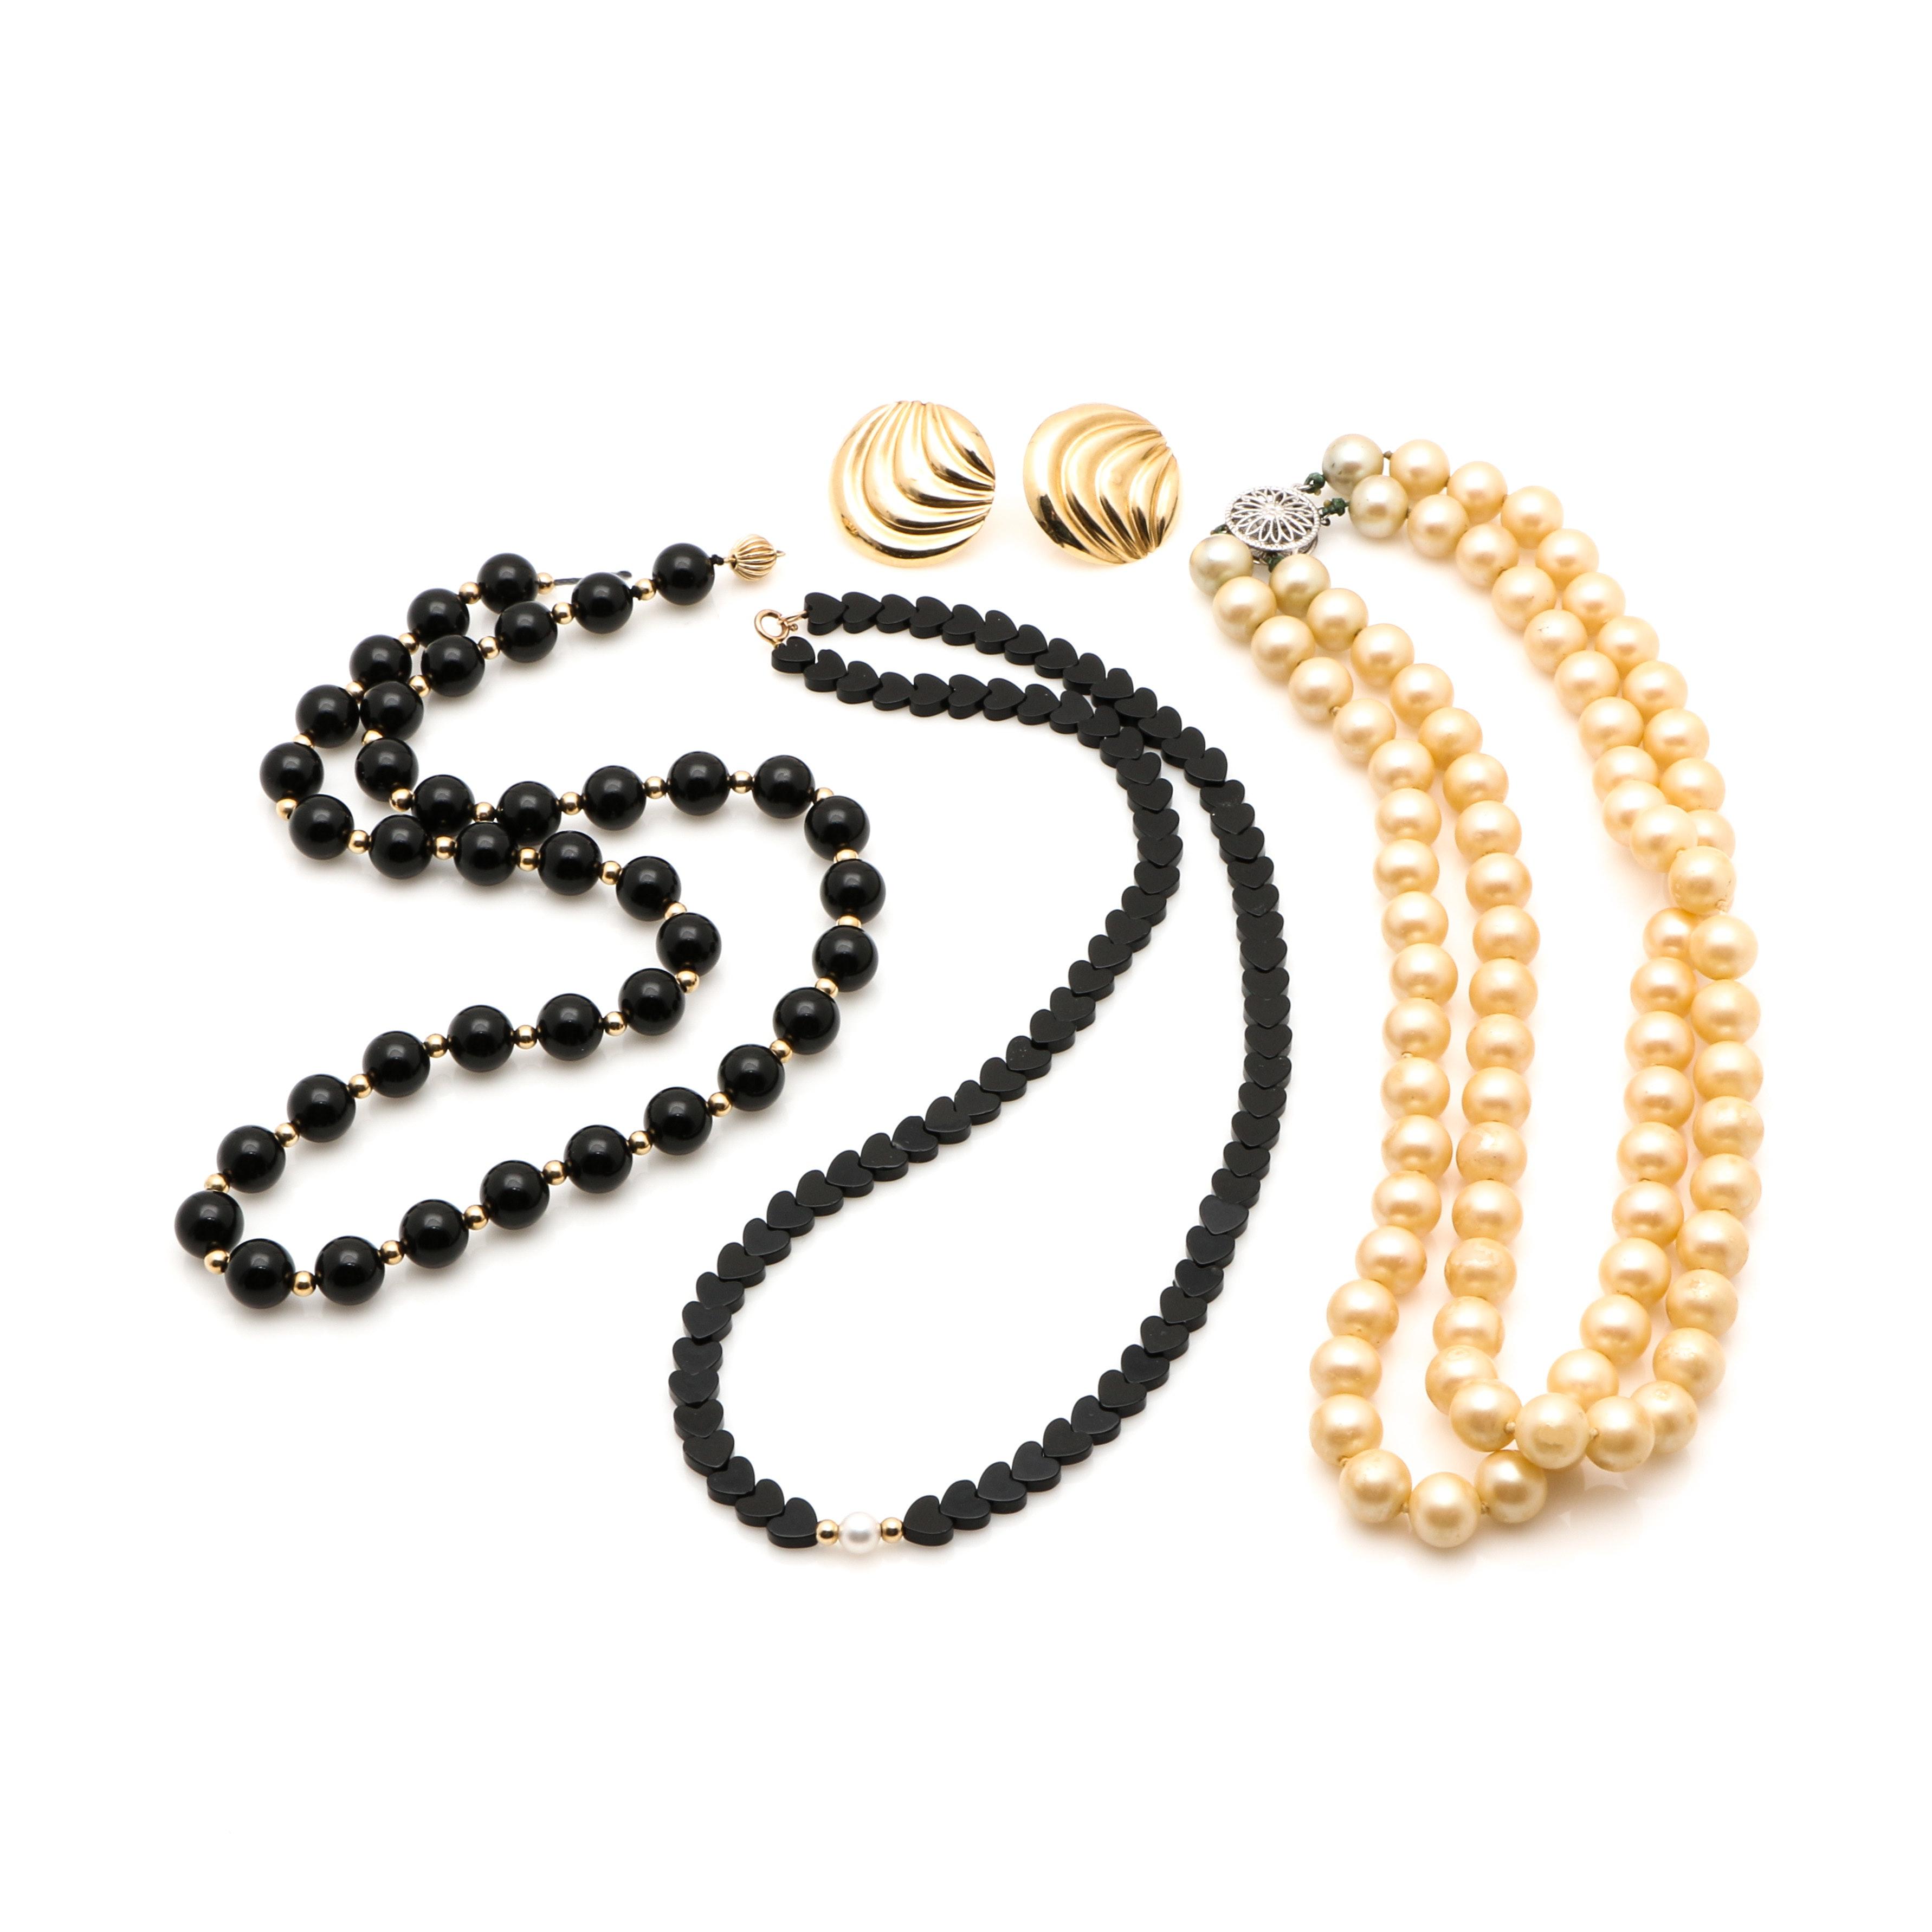 14K Yellow Gold and Gemstone Jewelry Assortment